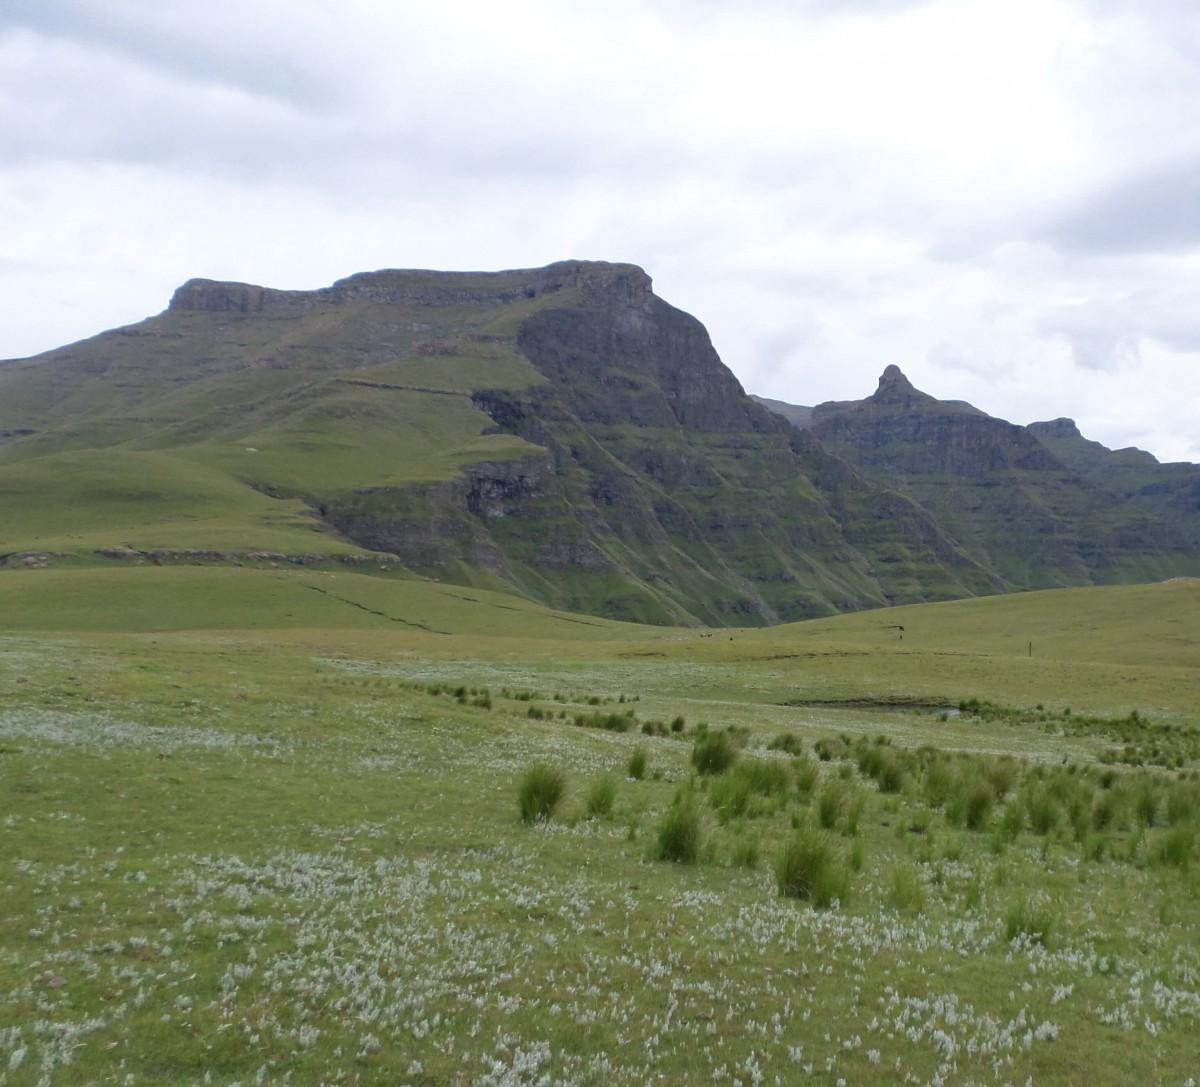 Walker's Peak